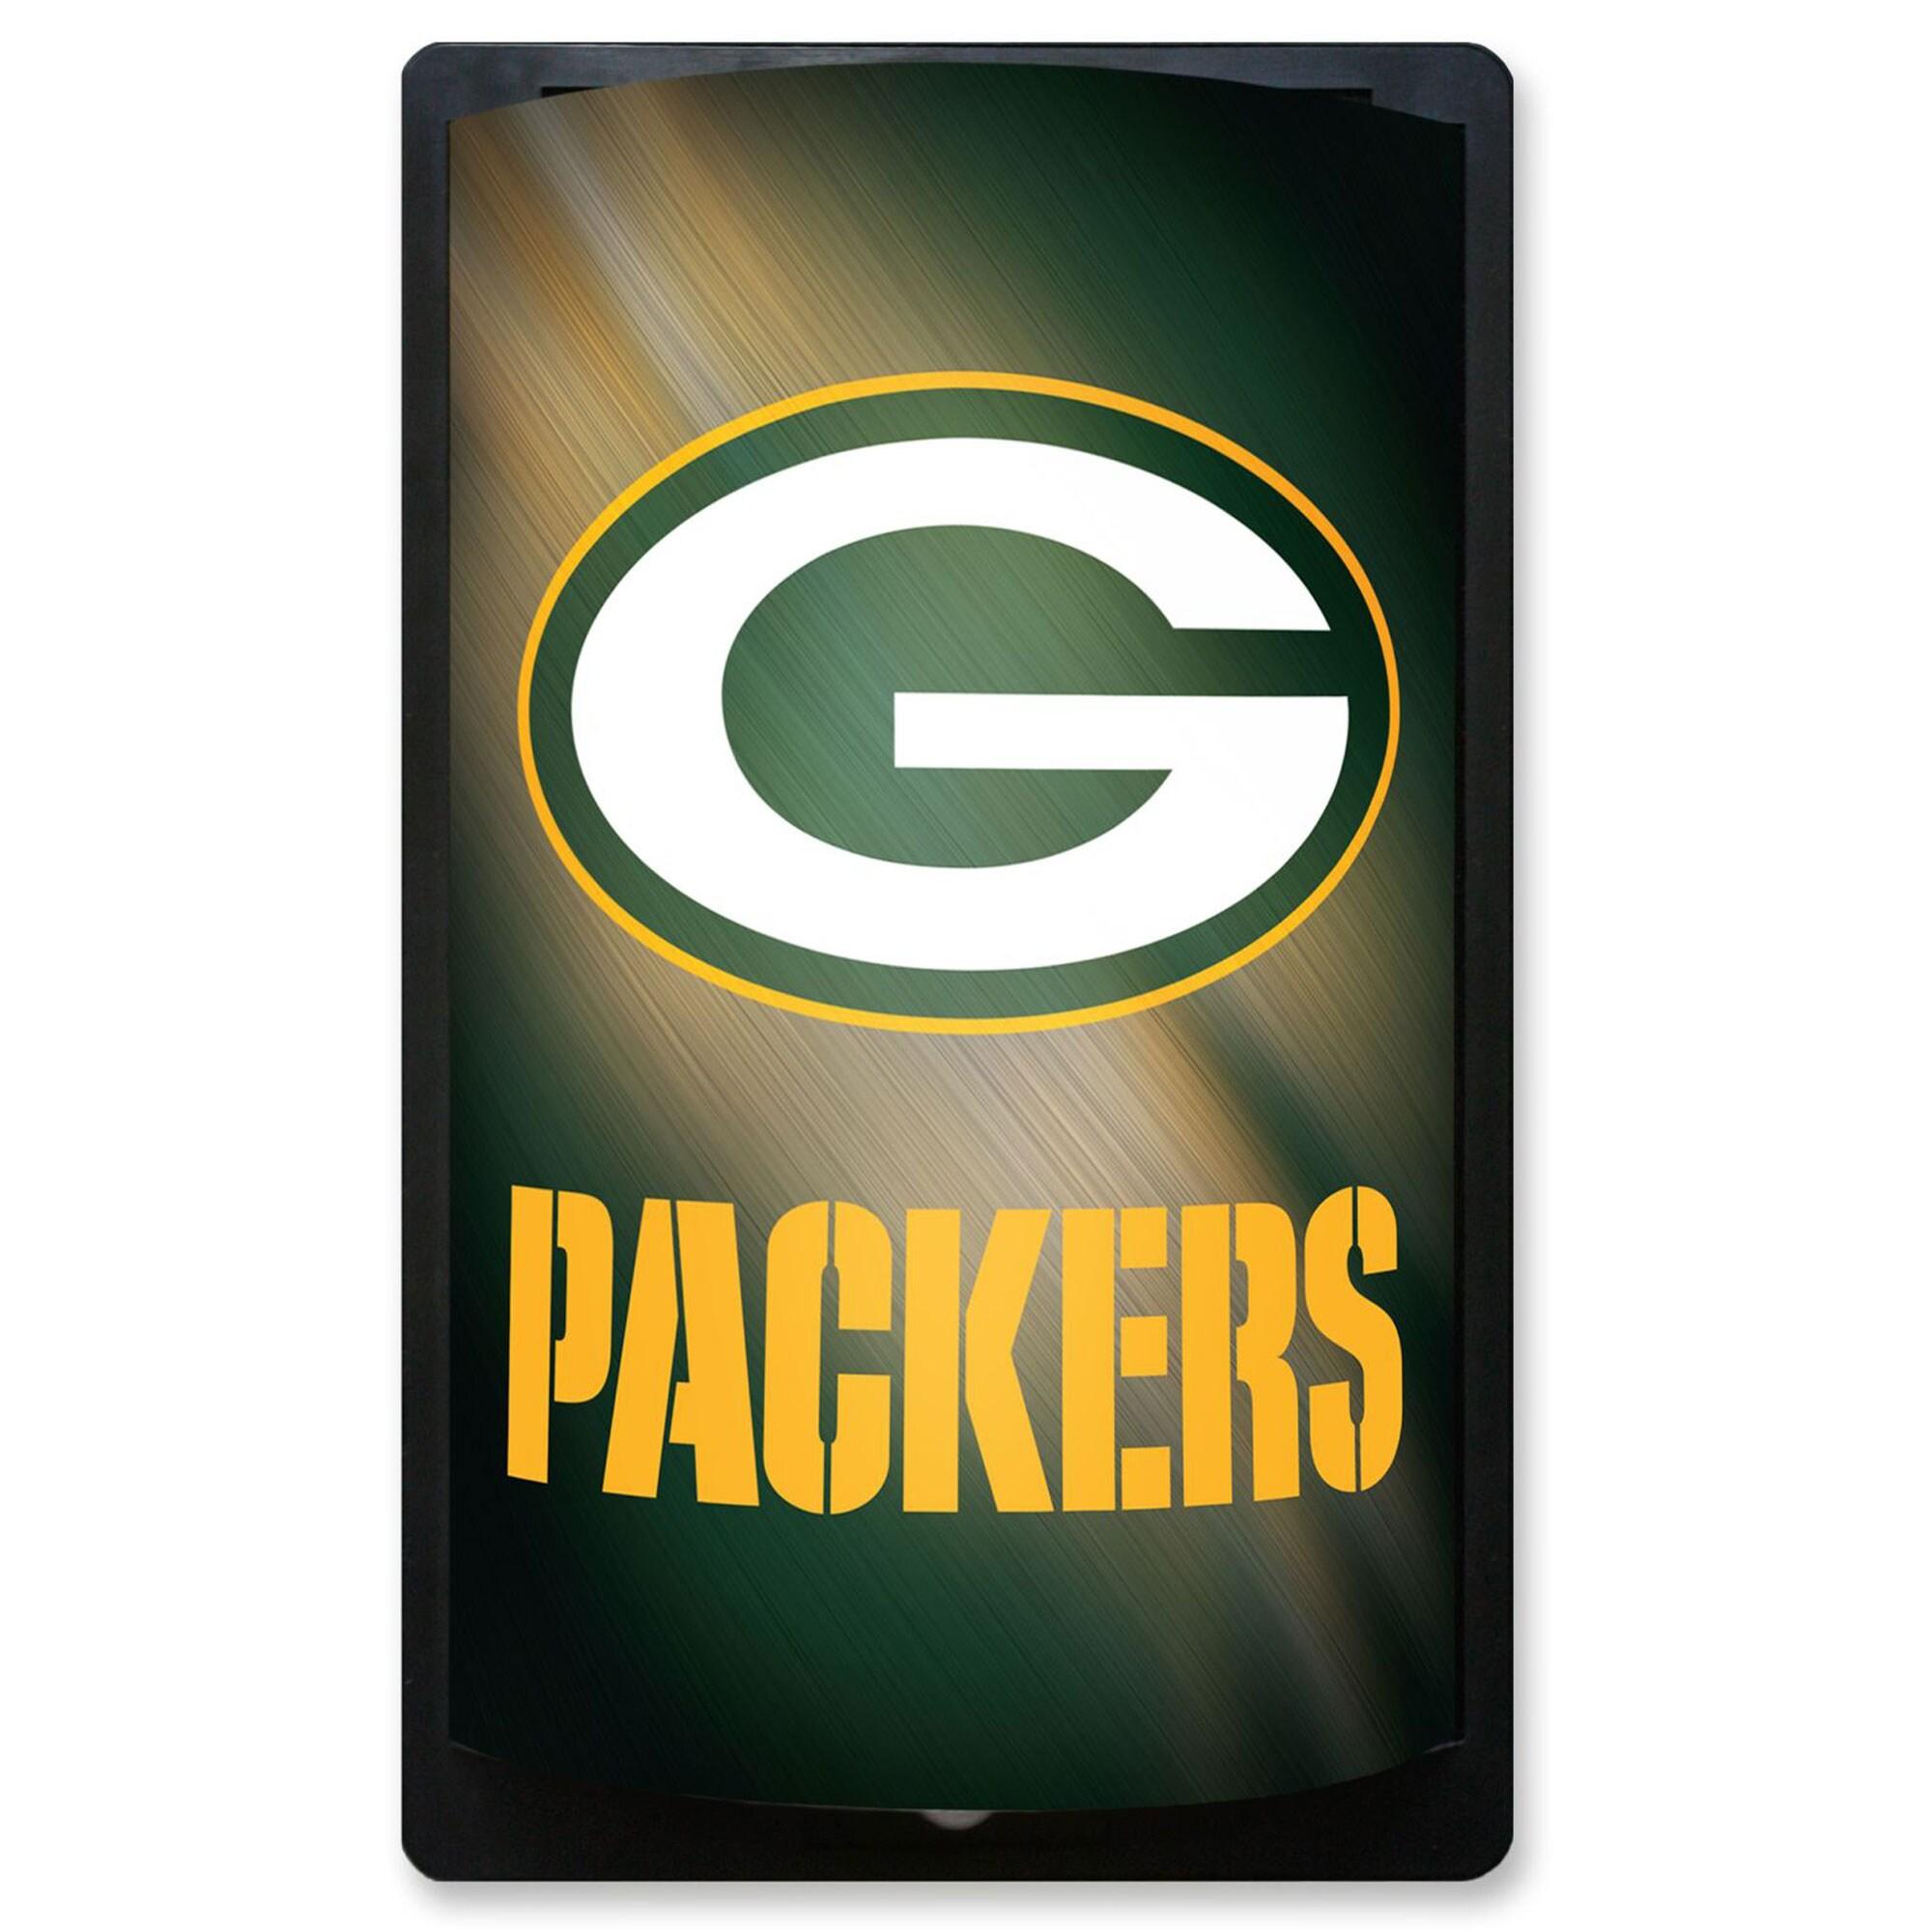 Green Bay Packers 12.5'' x 7.5'' MotiGlow Sign